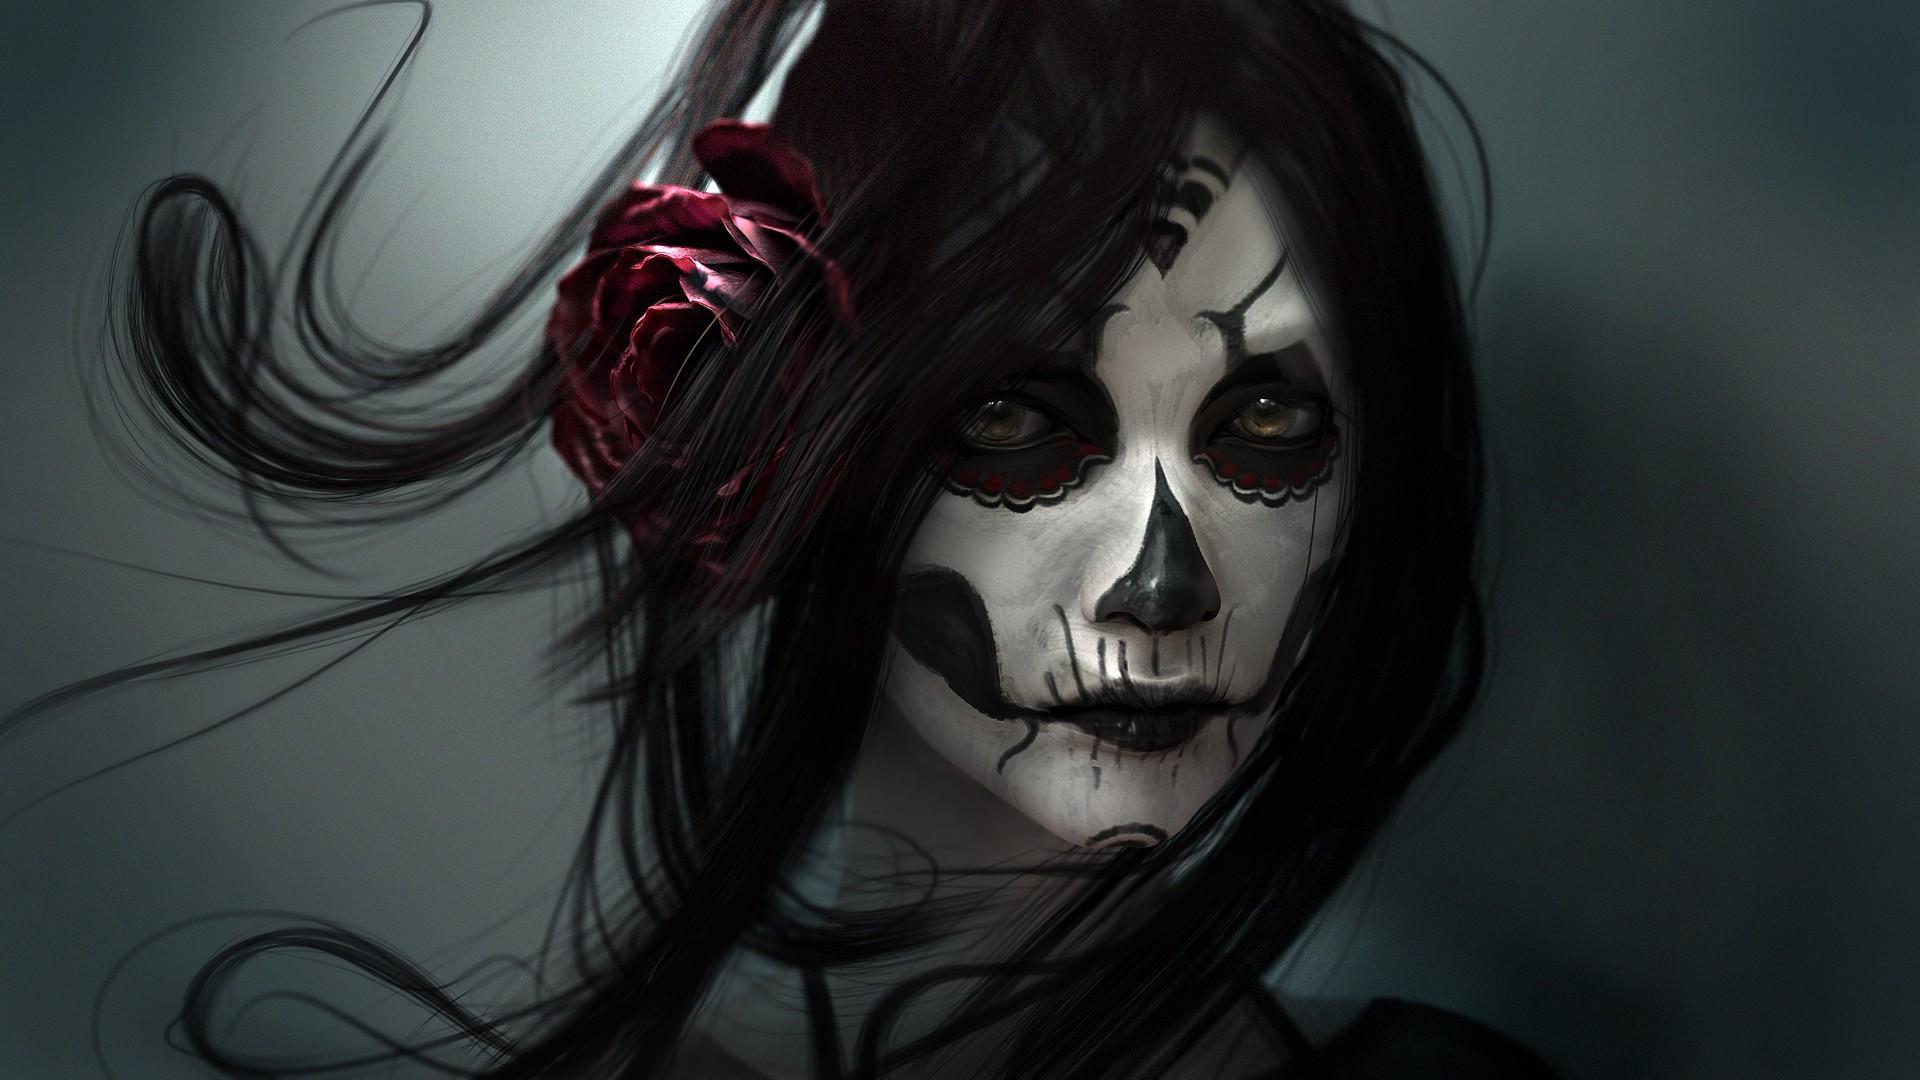 General 1920x1080 digital art face artwork rose dark hair looking at viewer skull women face paint Sugar Skull fantasy art Dia de los Muertos Wen-JR fantasy girl